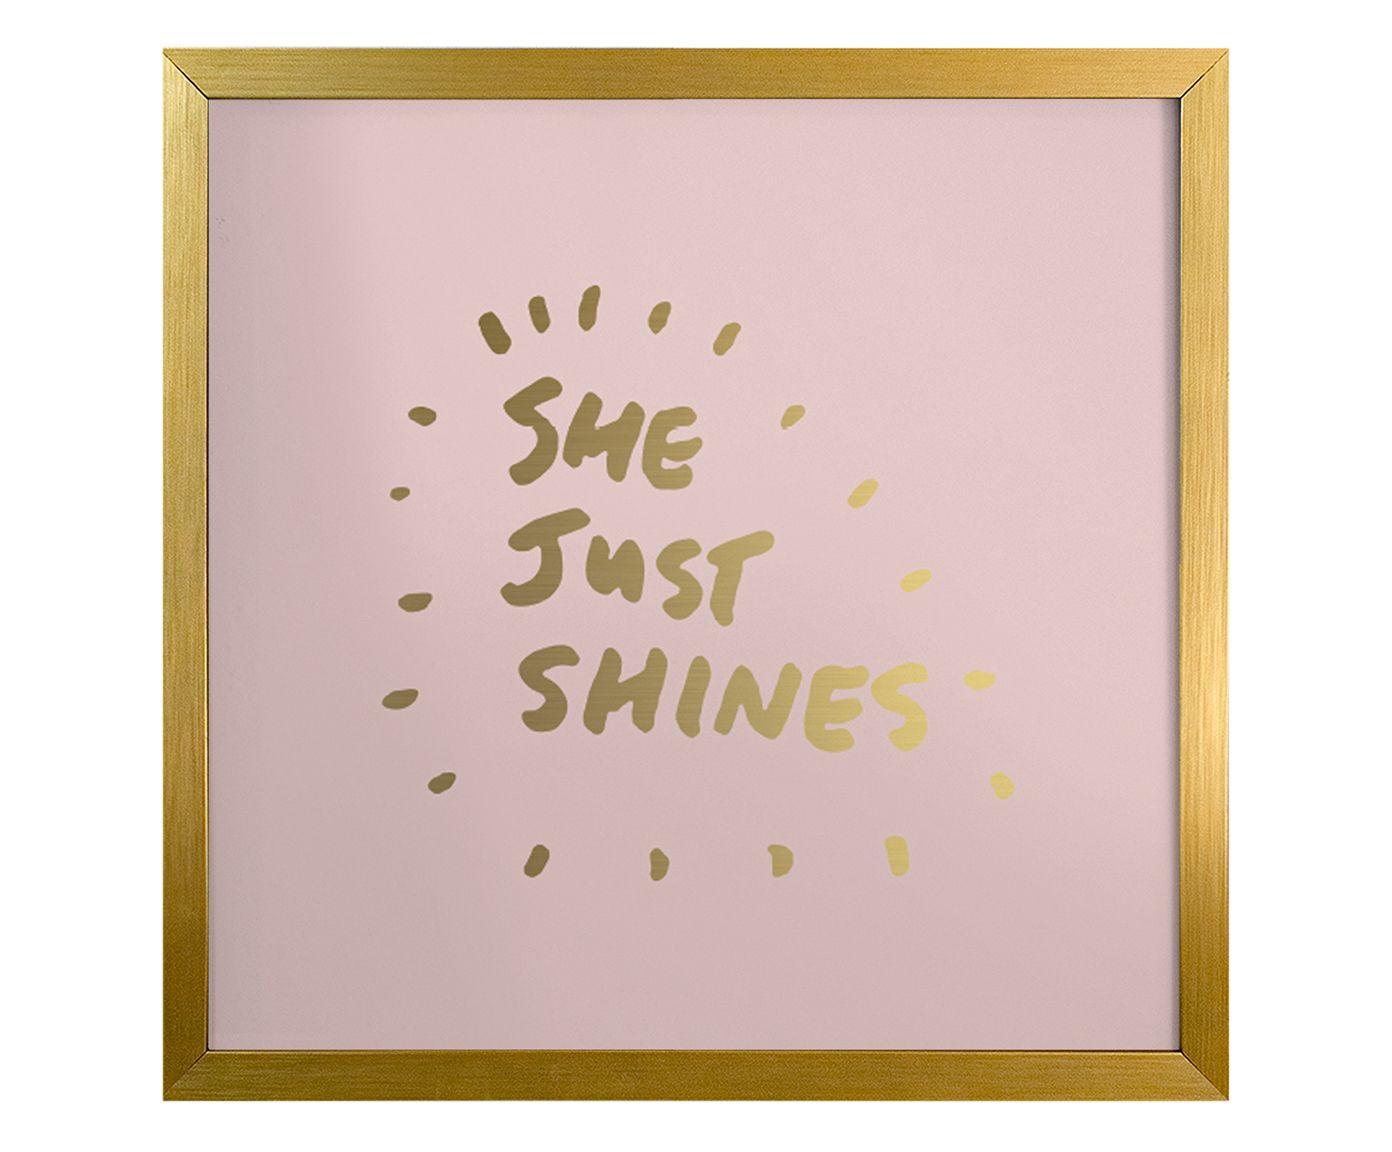 Quadro She Just Shines - 23X23cm | Westwing.com.br